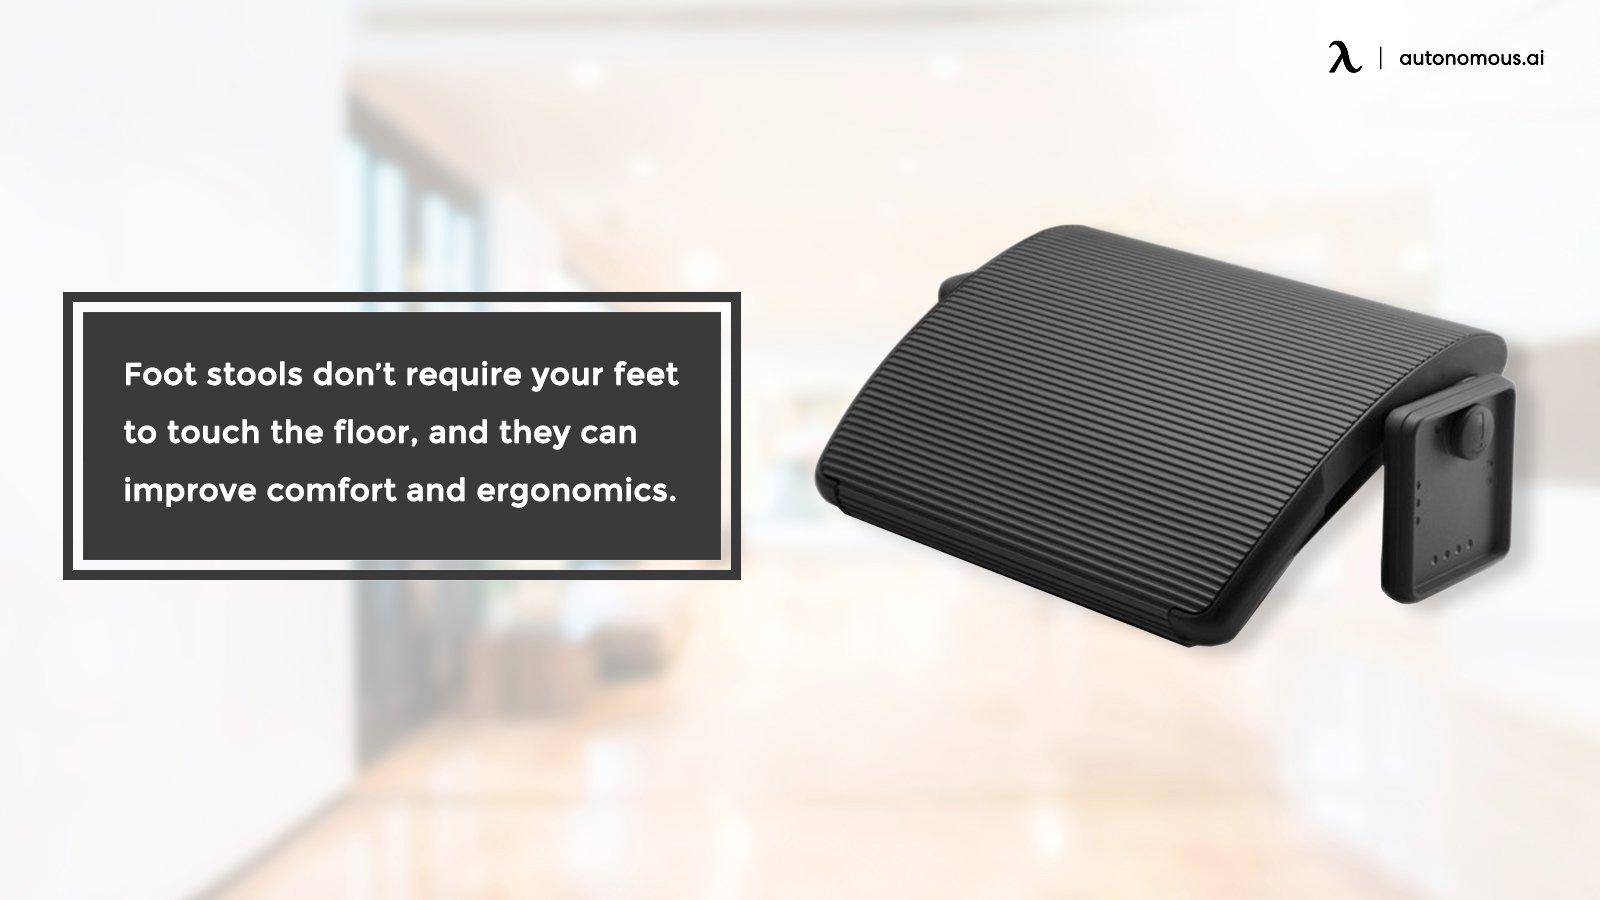 Foot stool for ergonomics and comfort